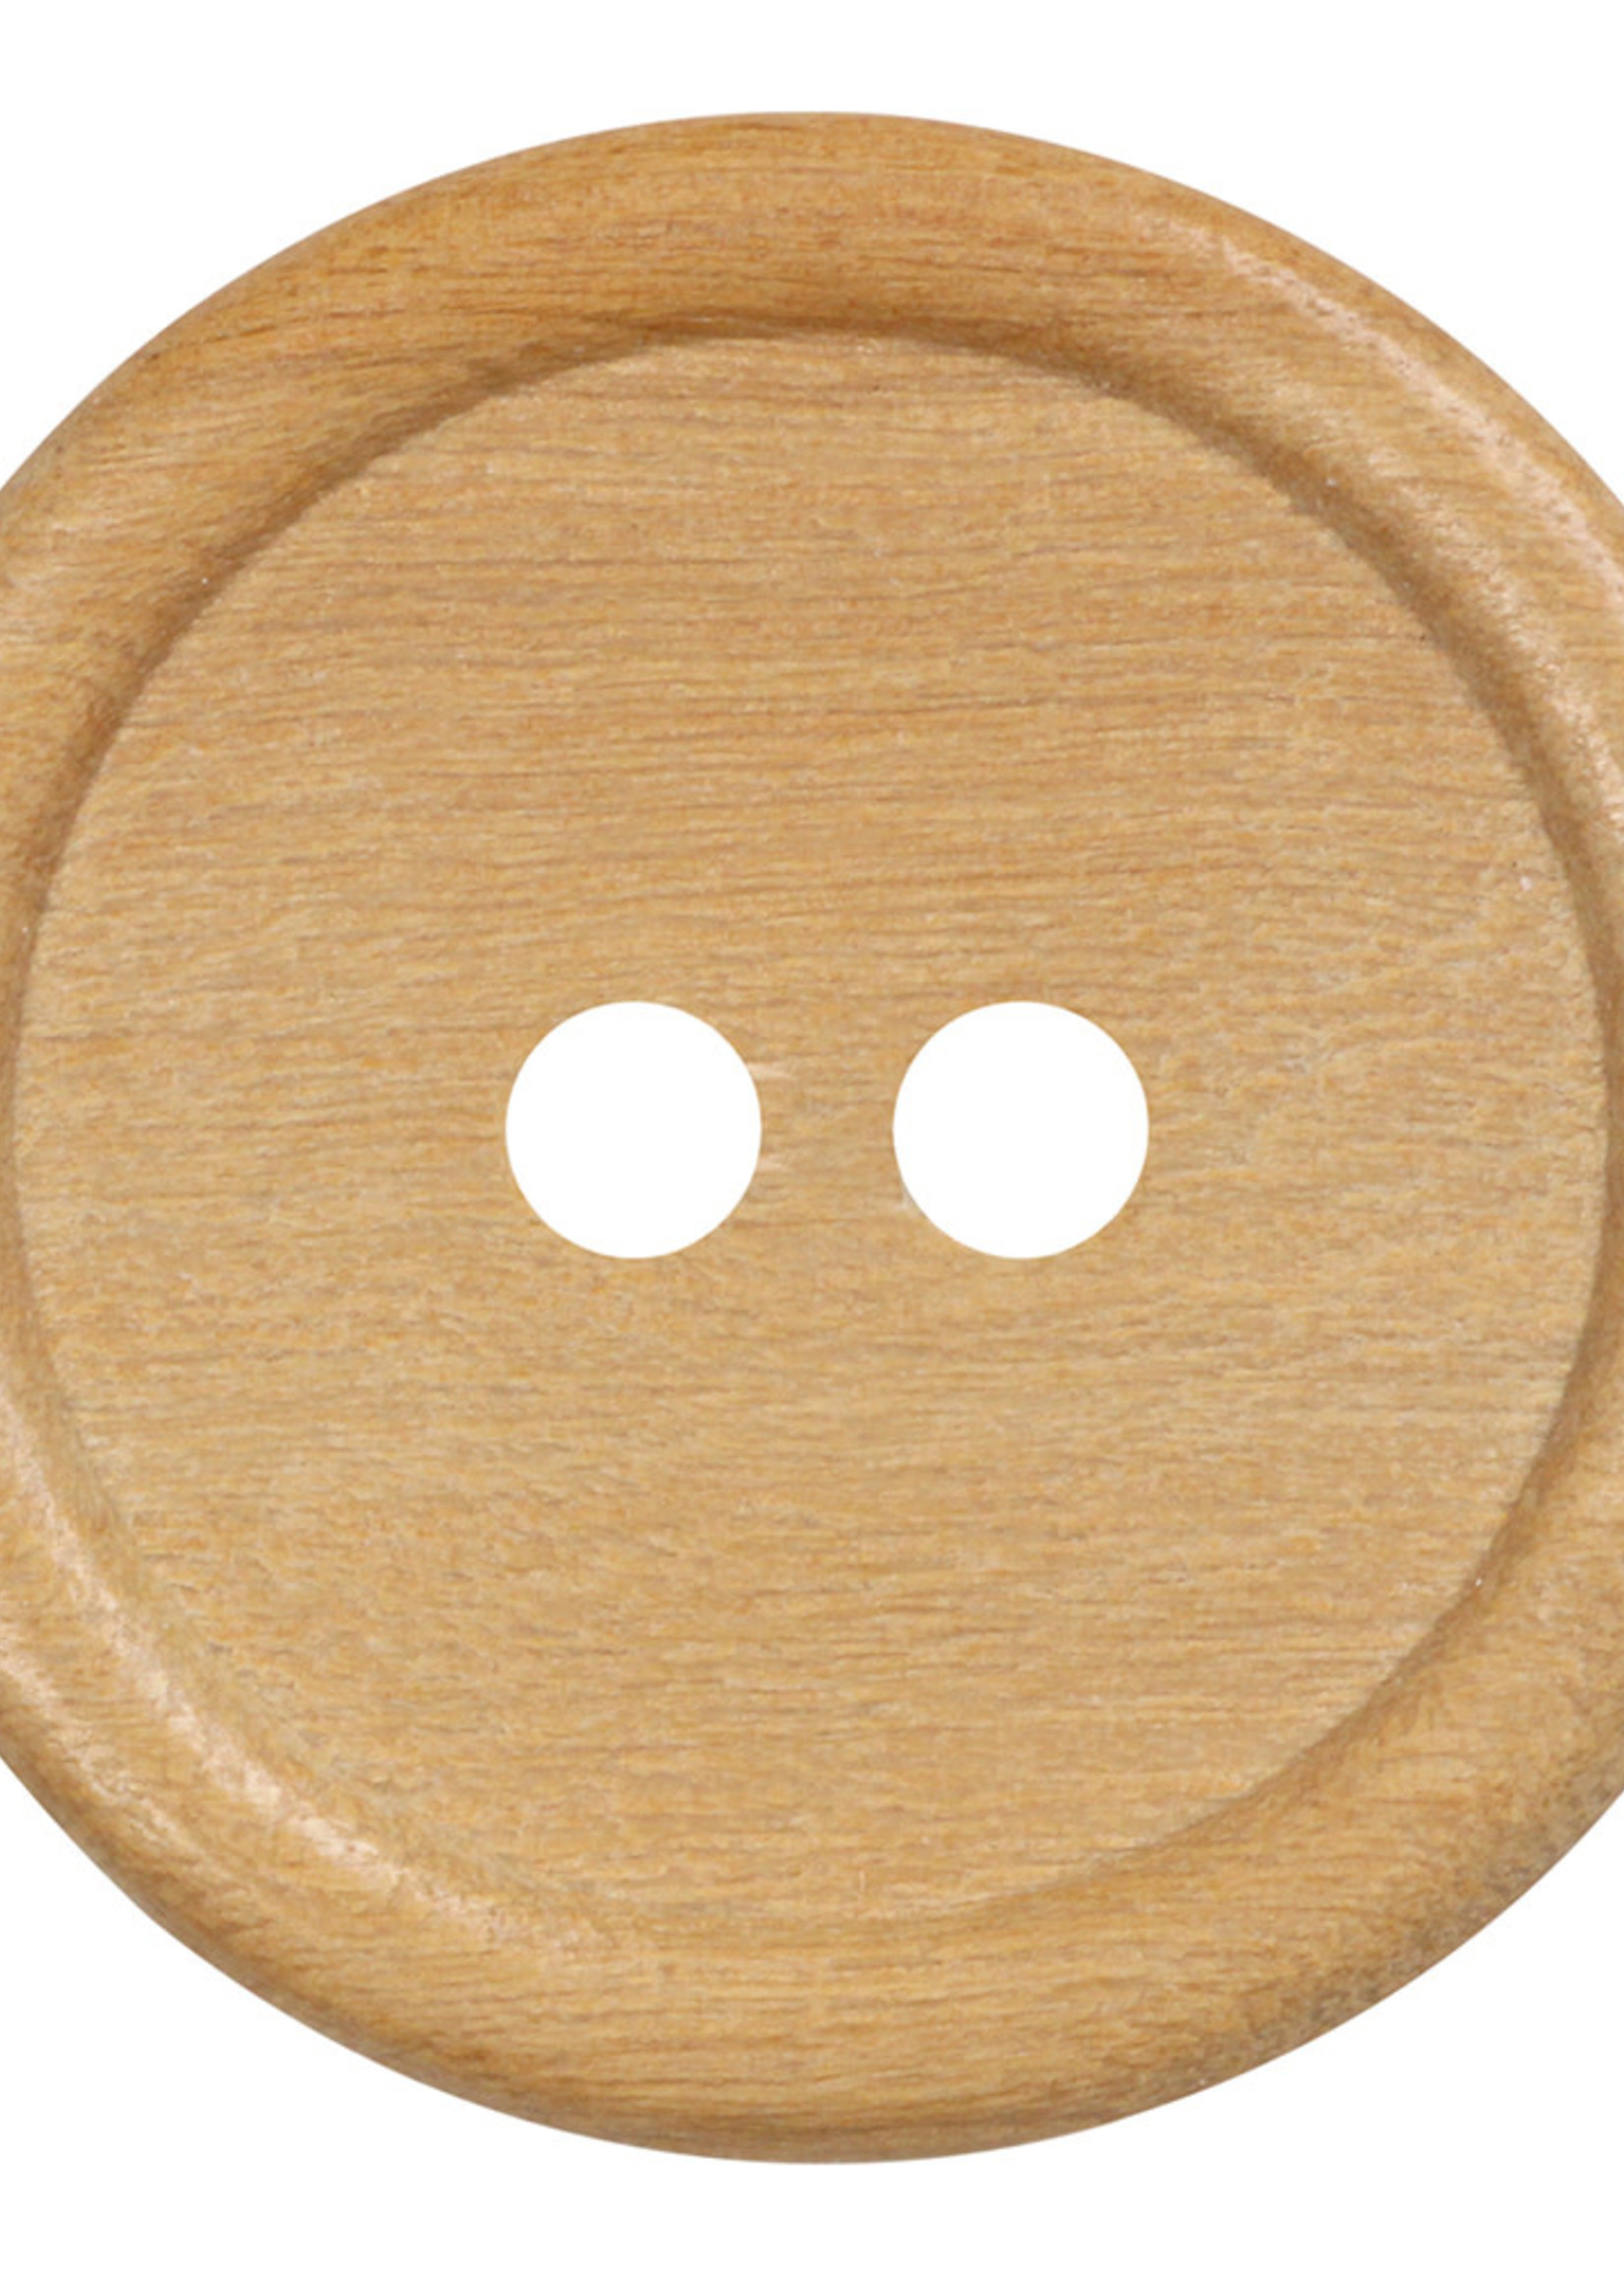 Elan Elan Buttons 302424A